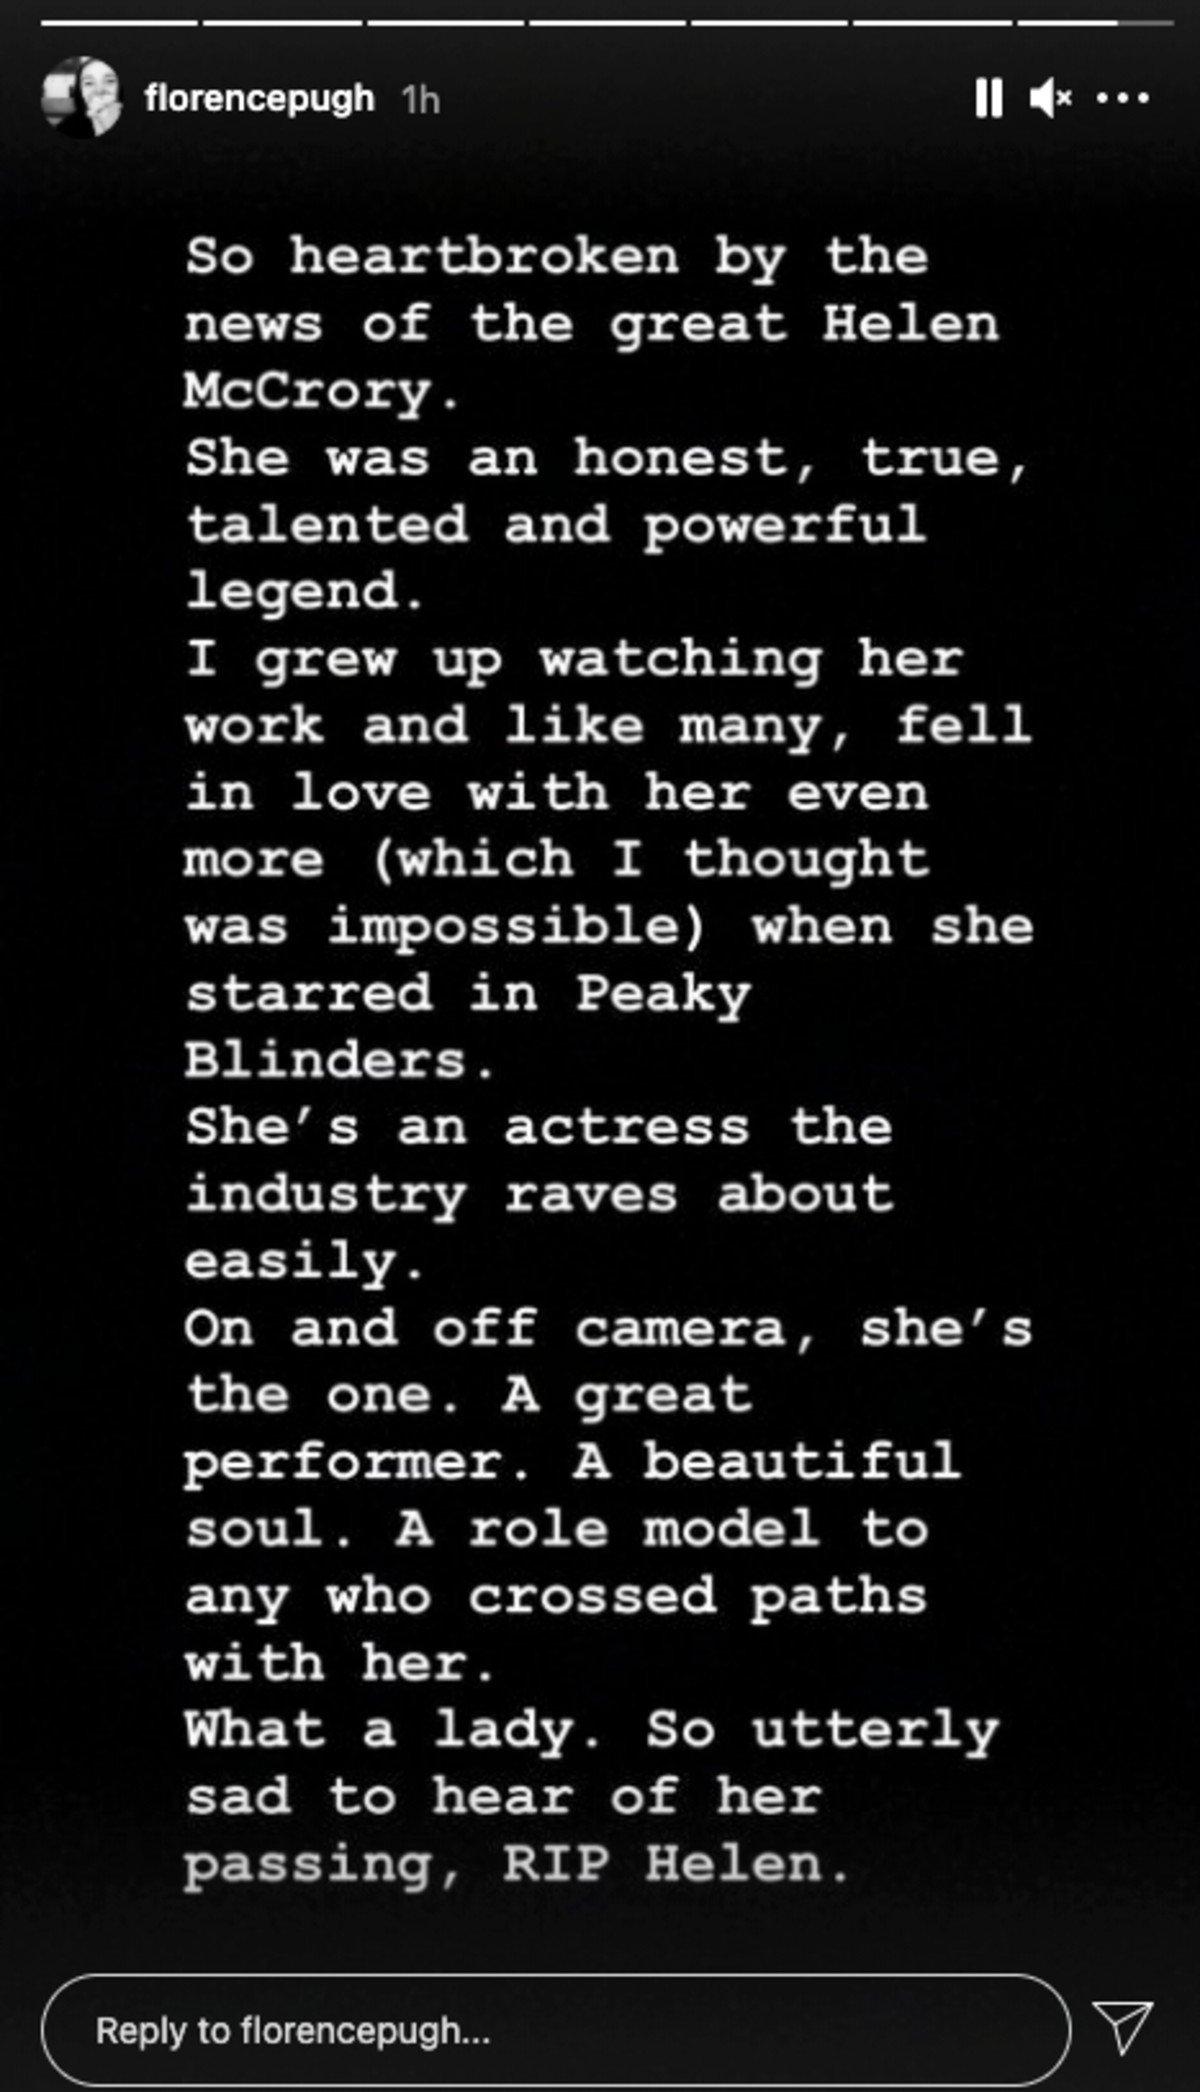 Florence Pugh Instagram message